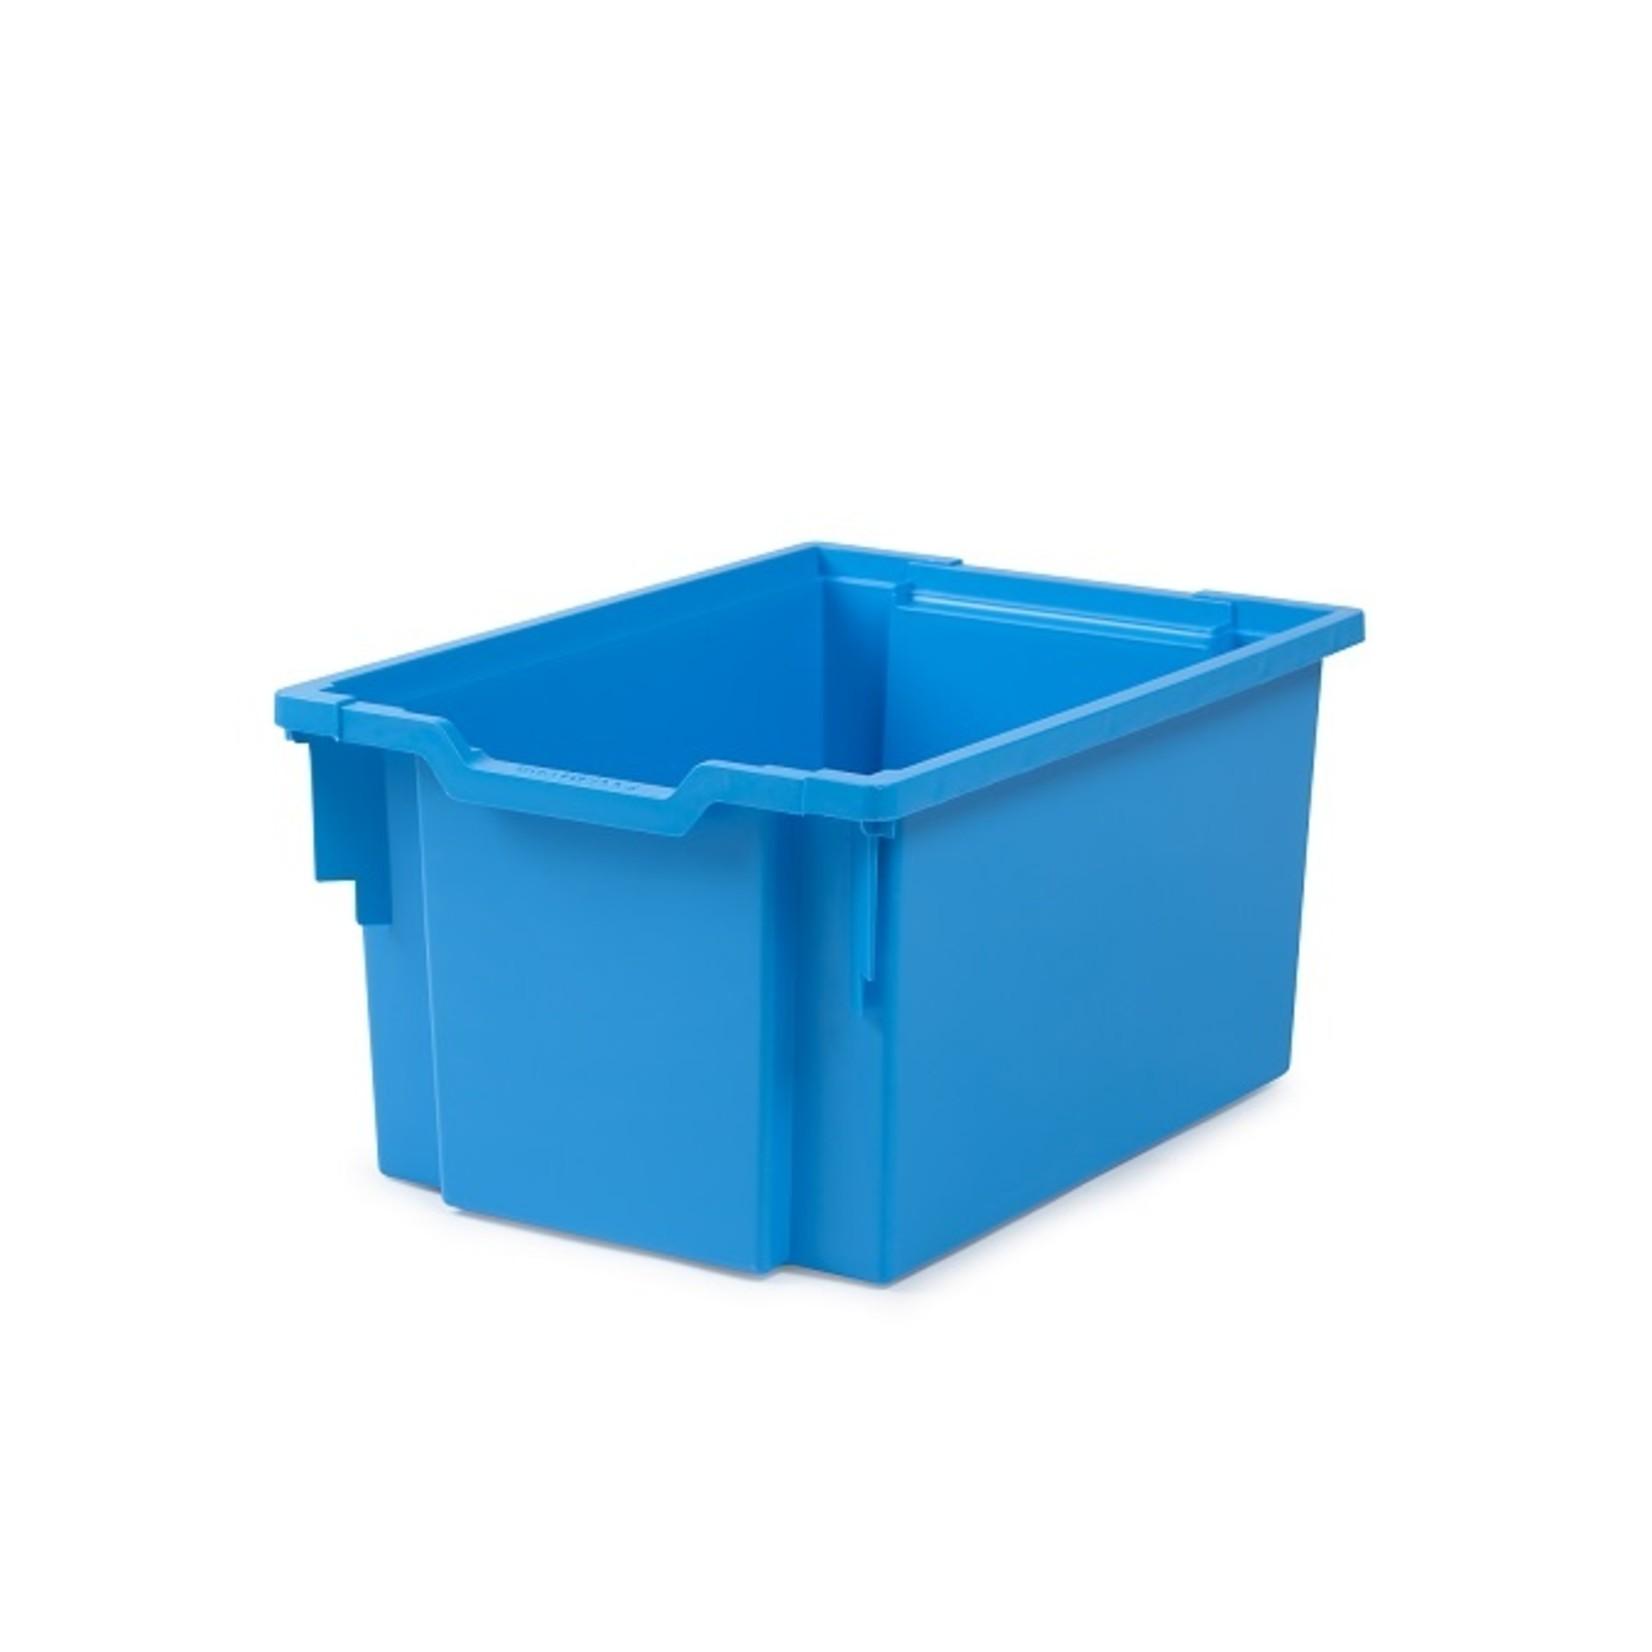 Gratnells Extra Deep F25 Tray Cyan Blue